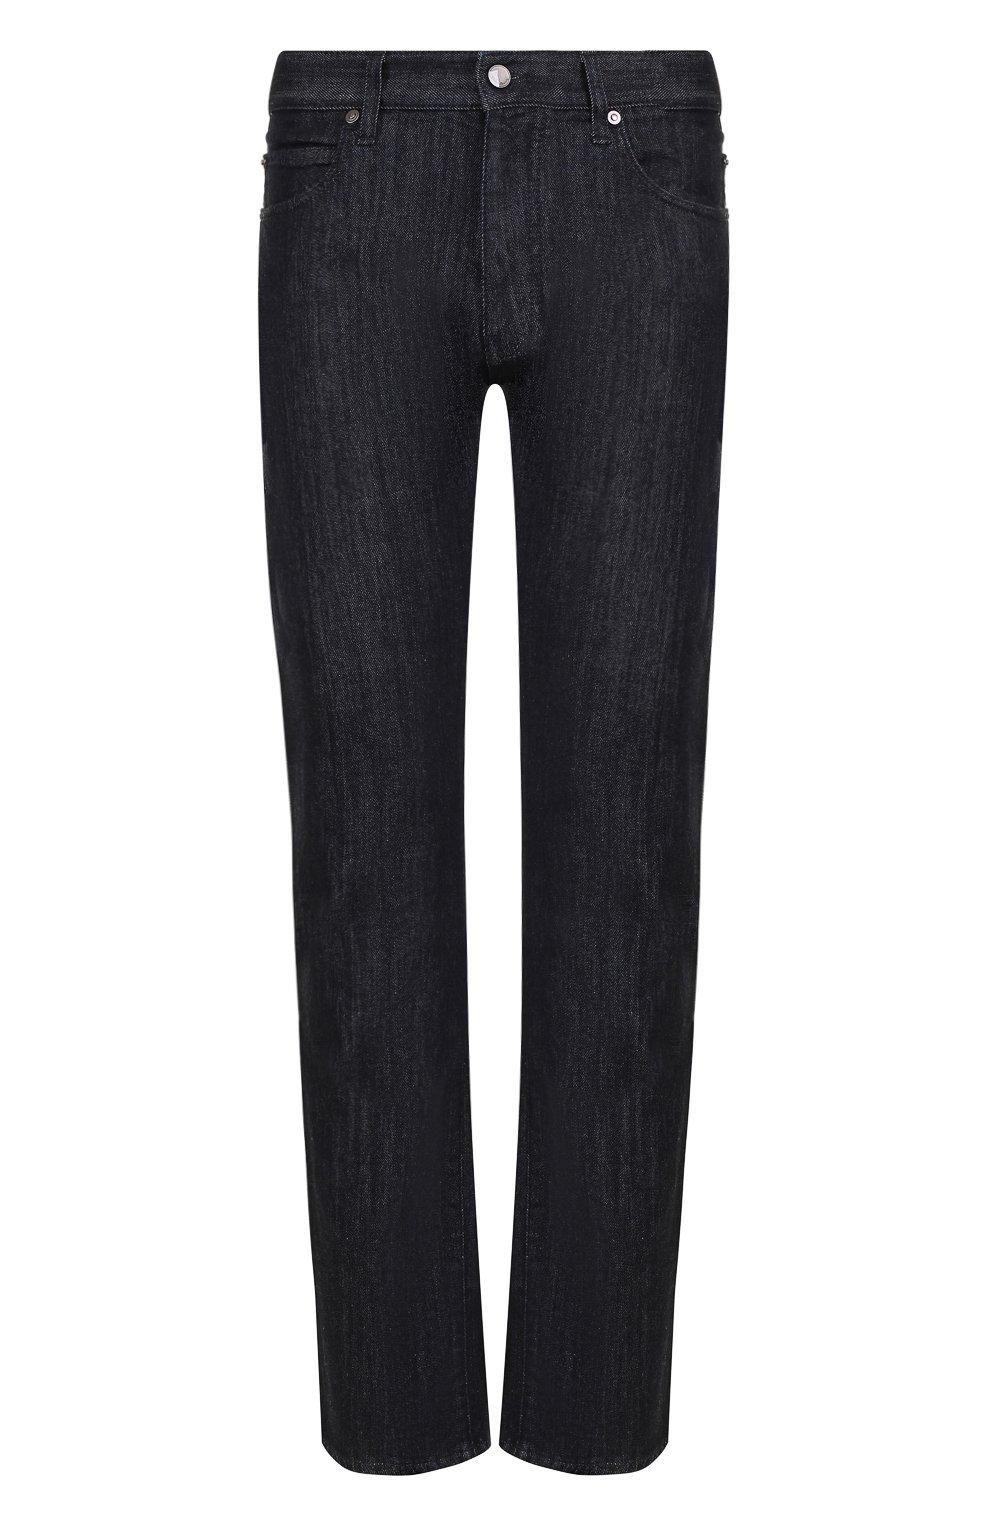 Мужские джинсы прямого кроя GIORGIO ARMANI синего цвета, арт. 6ZSJ02/SD30Z   Фото 1